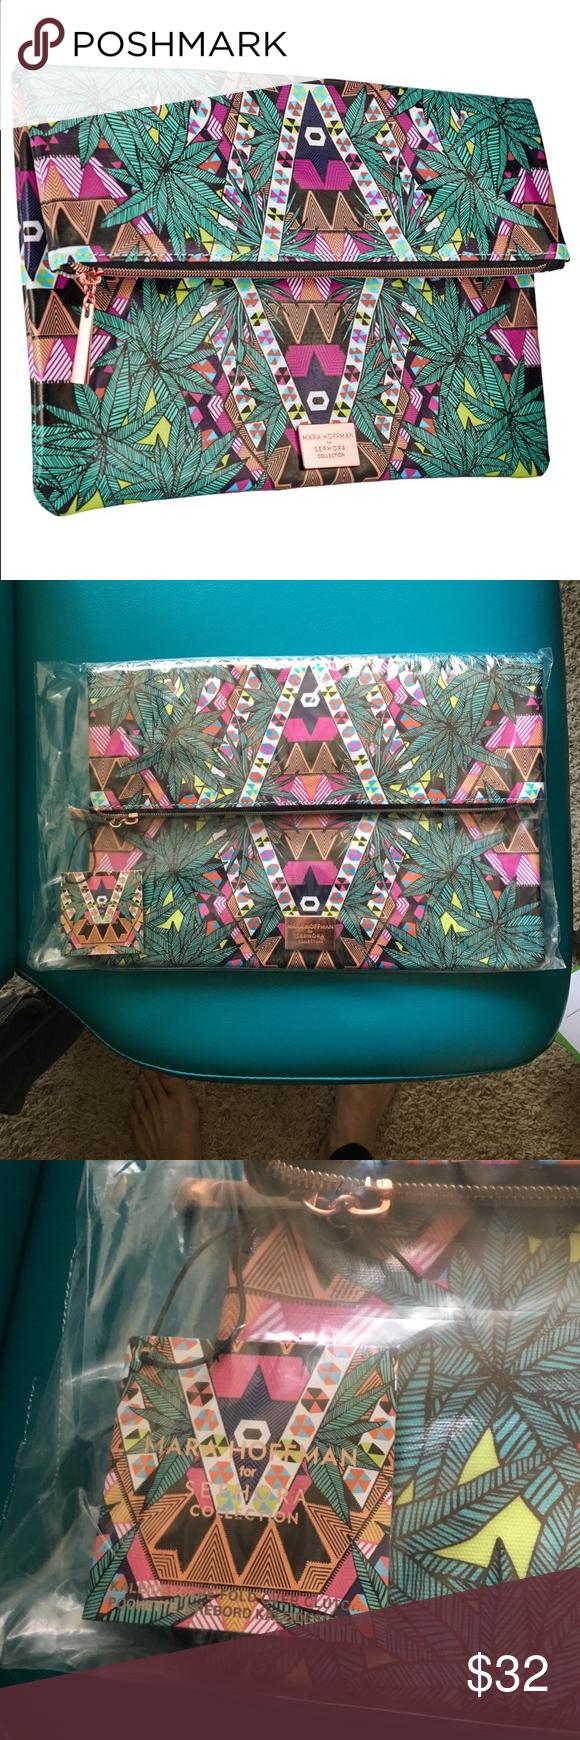 Mara Hoffman for sephora makeup bag Brand new makeup bag from sephora. Mara Hoffman Bags Cosmetic Bags & Cases